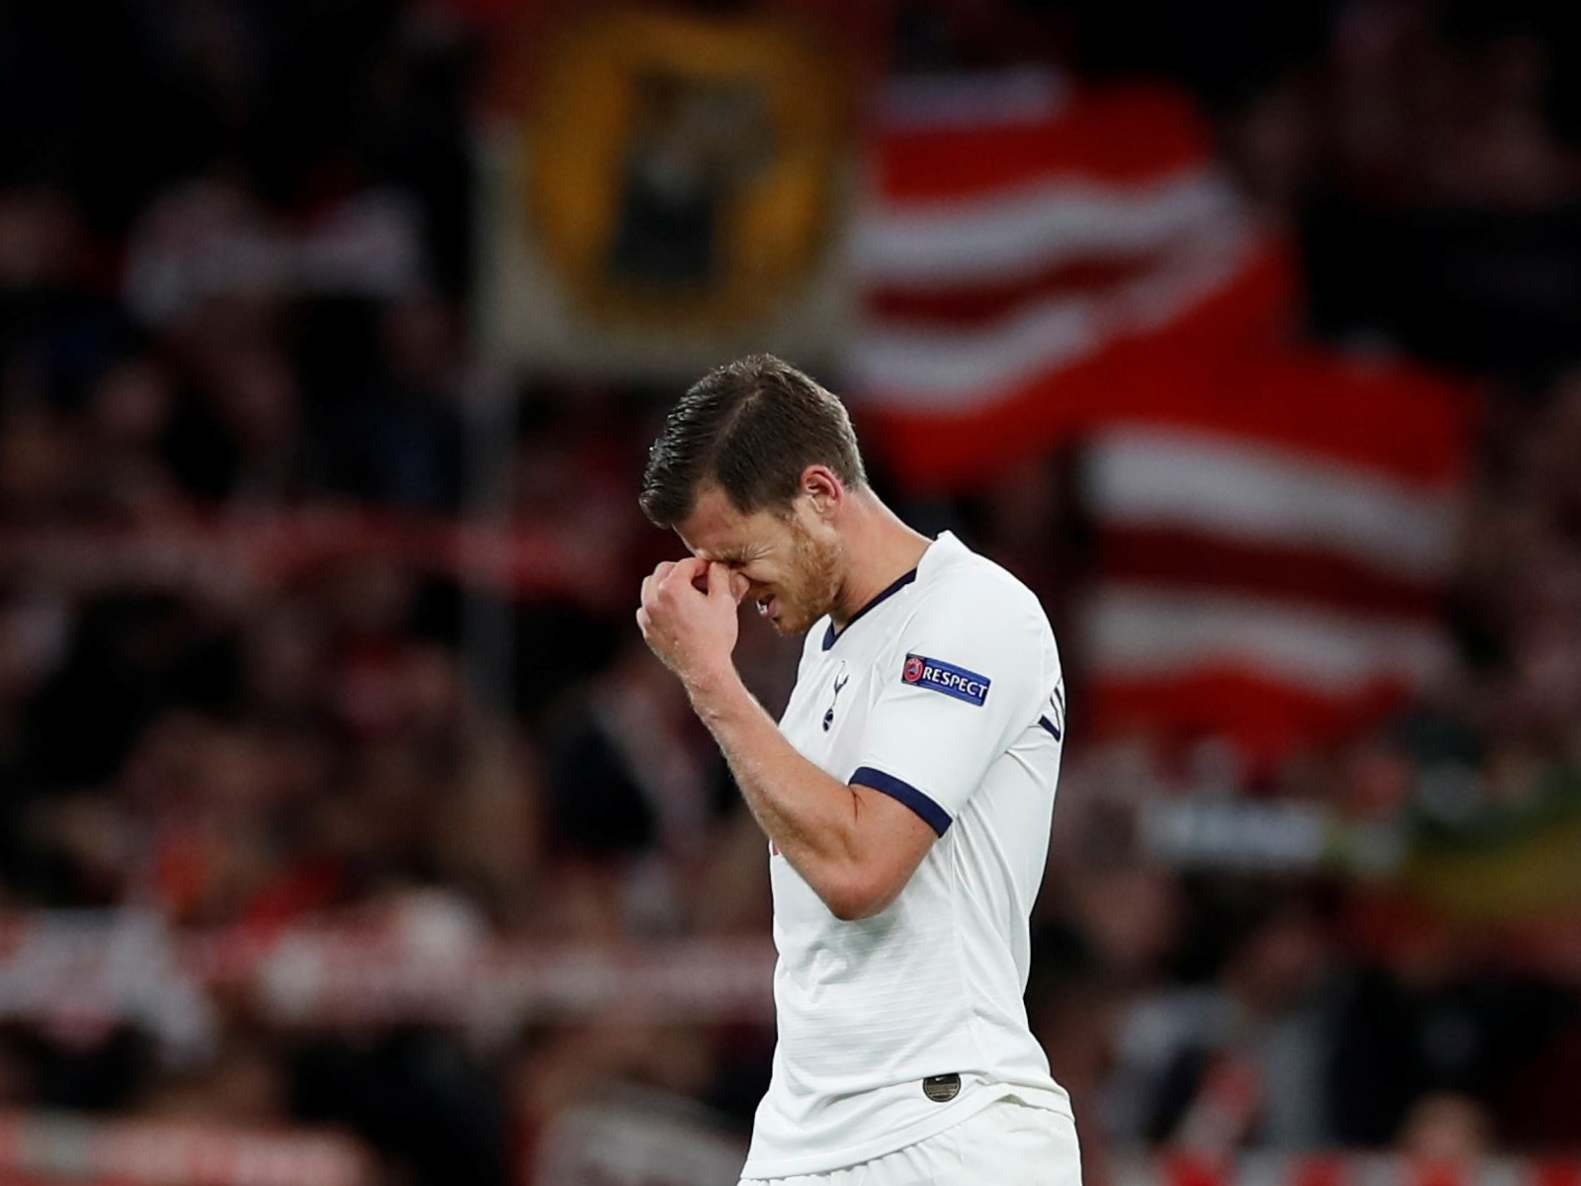 Tottenham vs Bayern Munich: Jan Vertonghen 'ashamed and embarrassed' after Spurs humiliated